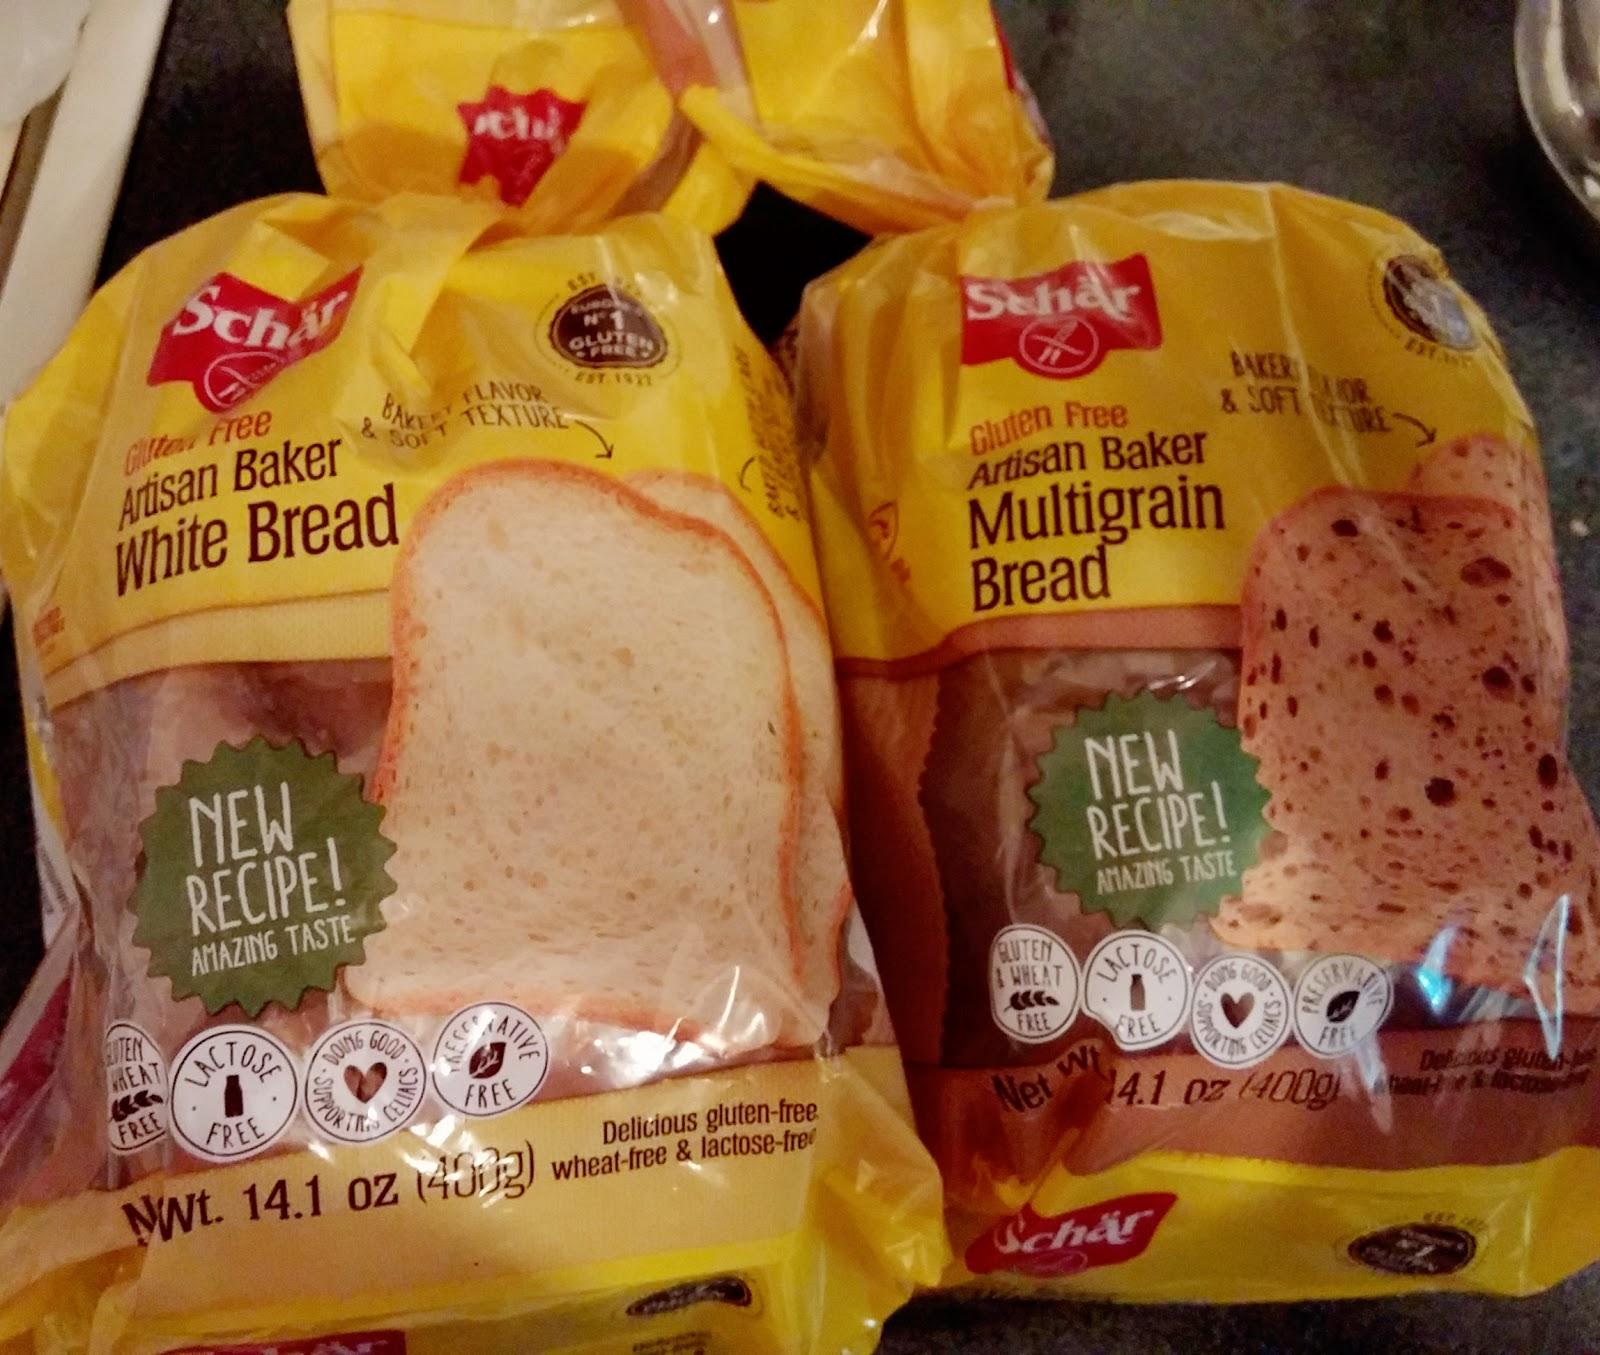 Cook Scrap Craft Schar GlutenFree Artisan Bread